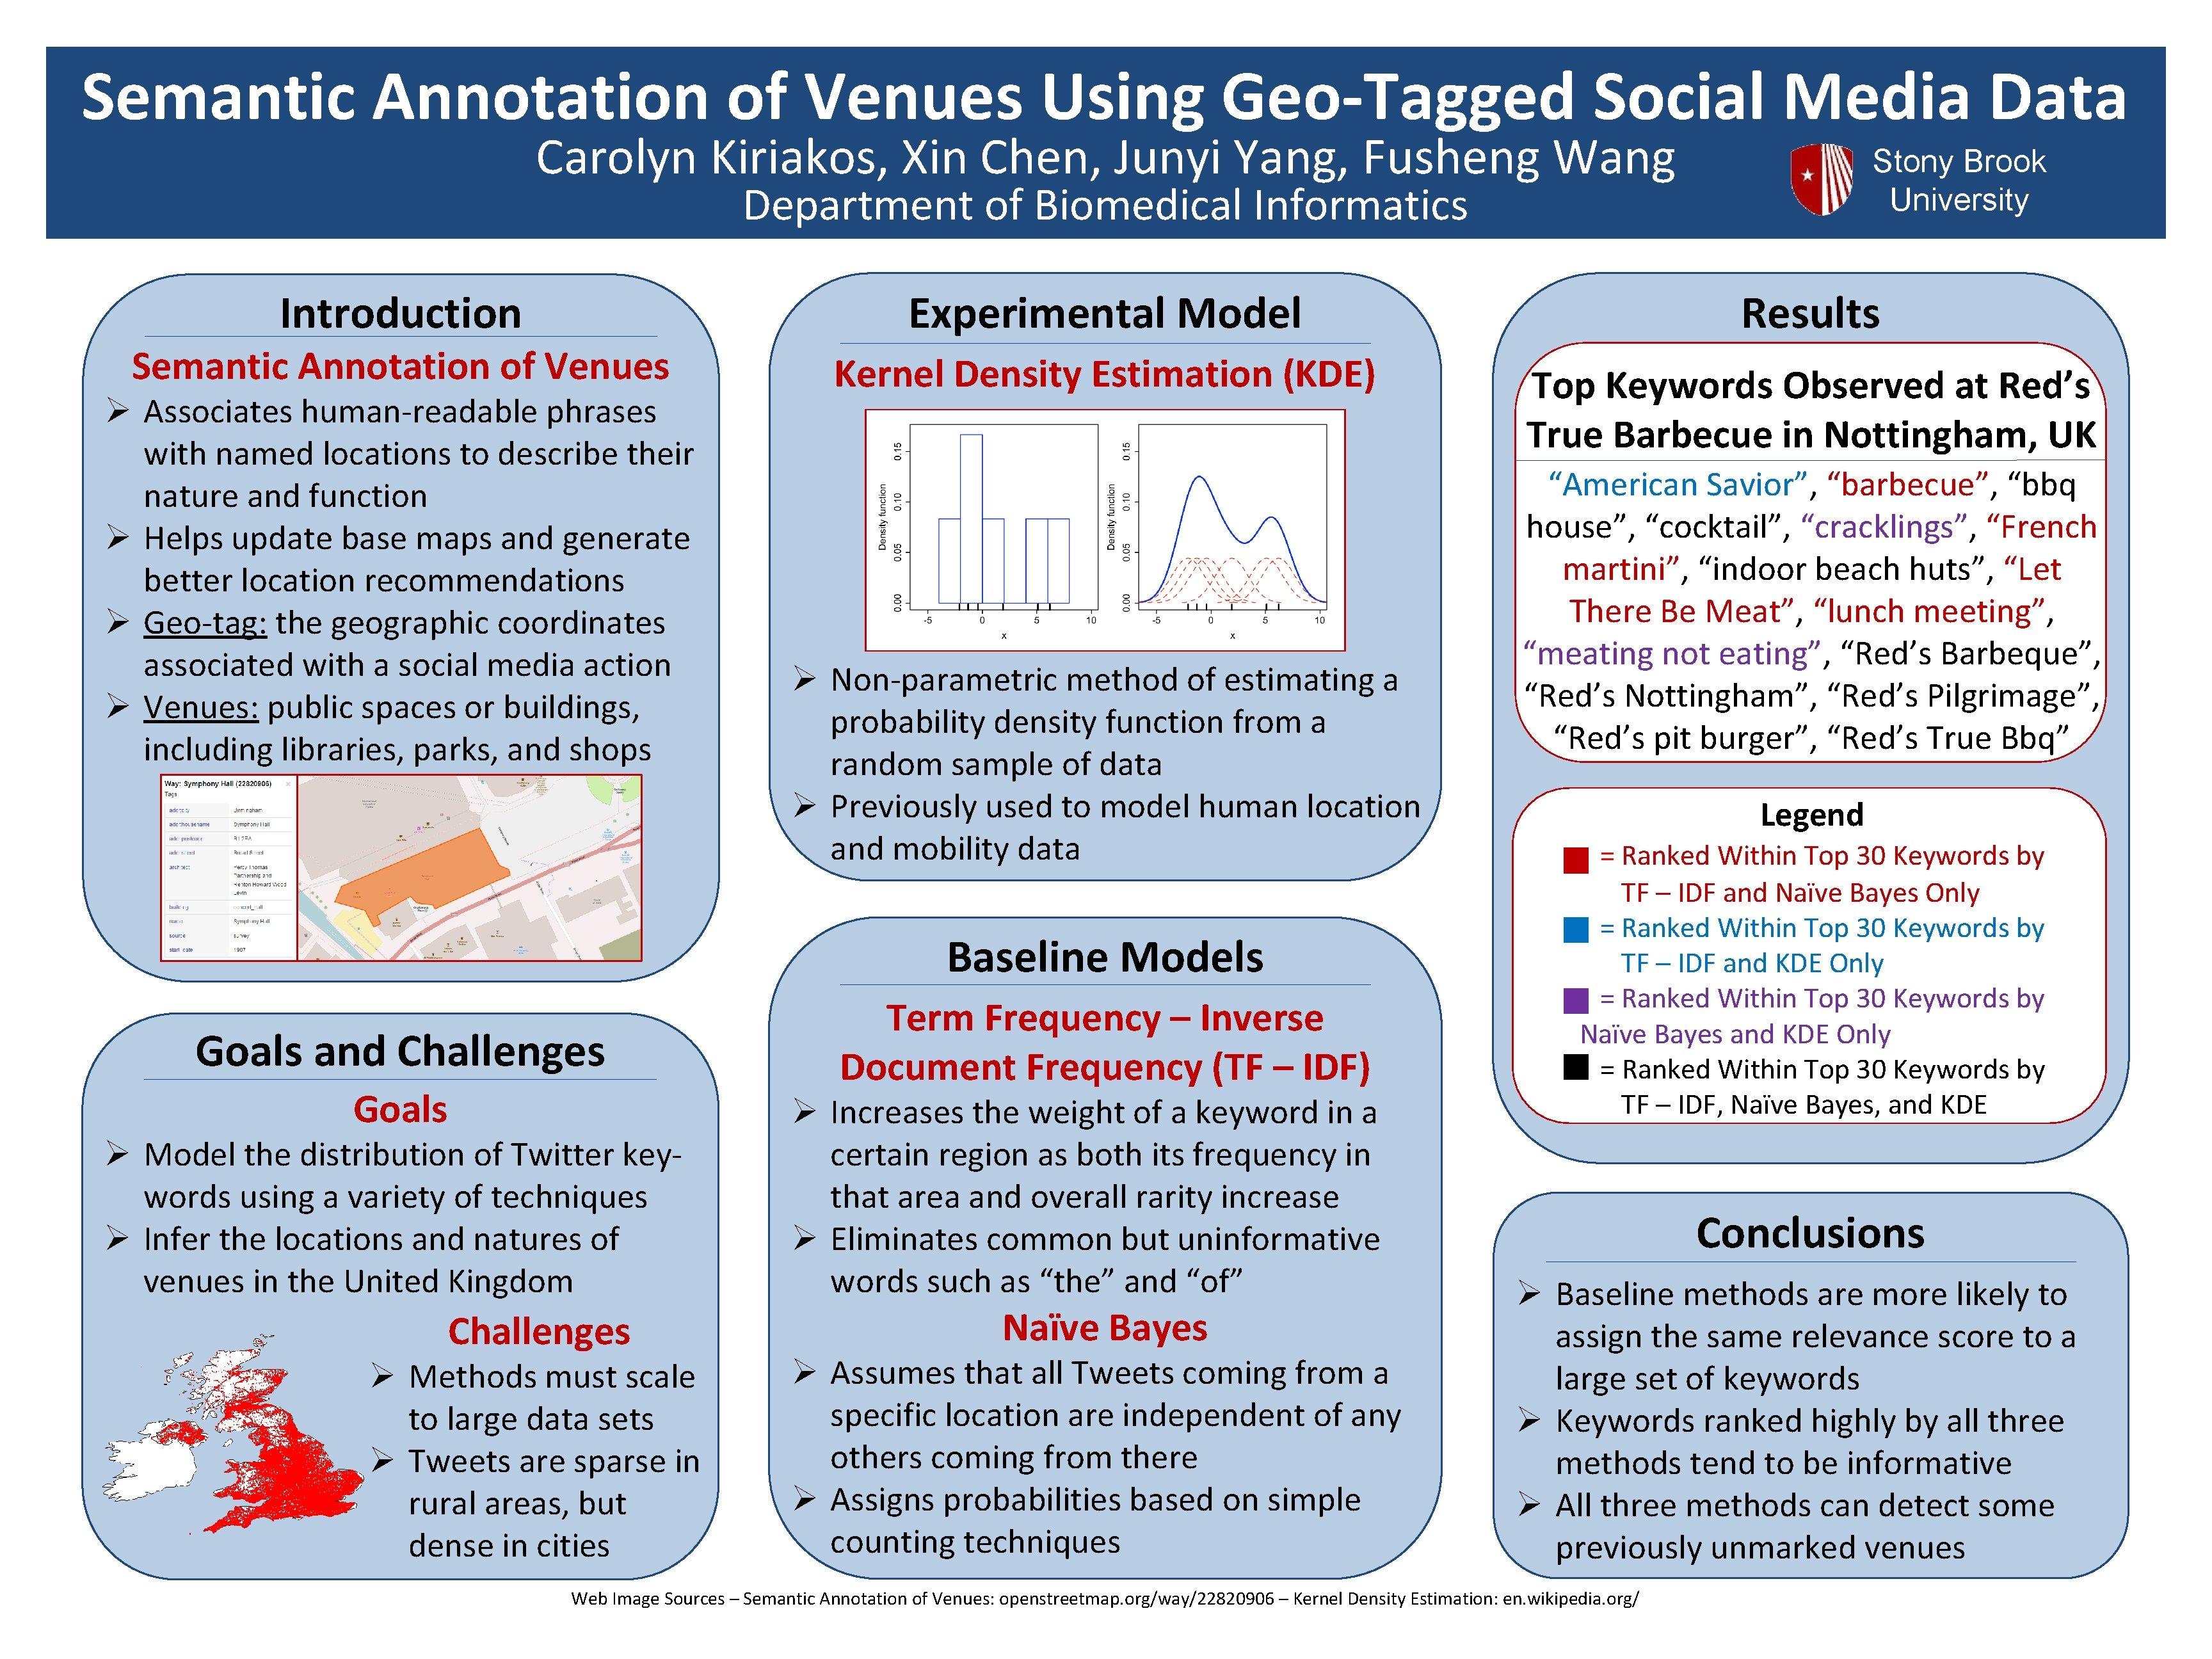 Semantic Annotation of Venues Using Geo-Tagged Social Media Data Carolyn Kiriakos, Xin Chen, Junyi